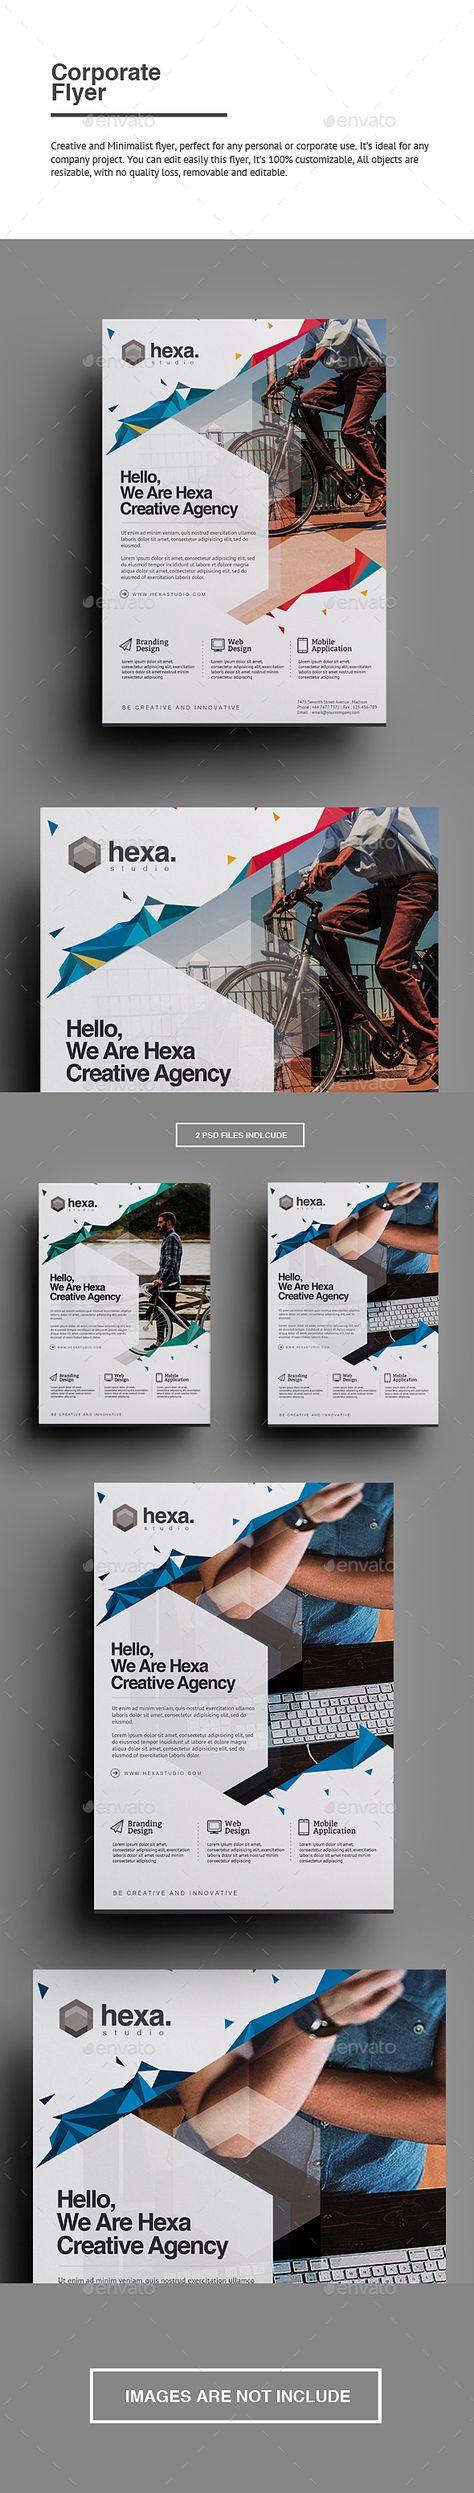 Corporate Flyer Template PSD #design Download: http://graphicriver.net/item/corporate-flyer-/13593769?ref=ksioks